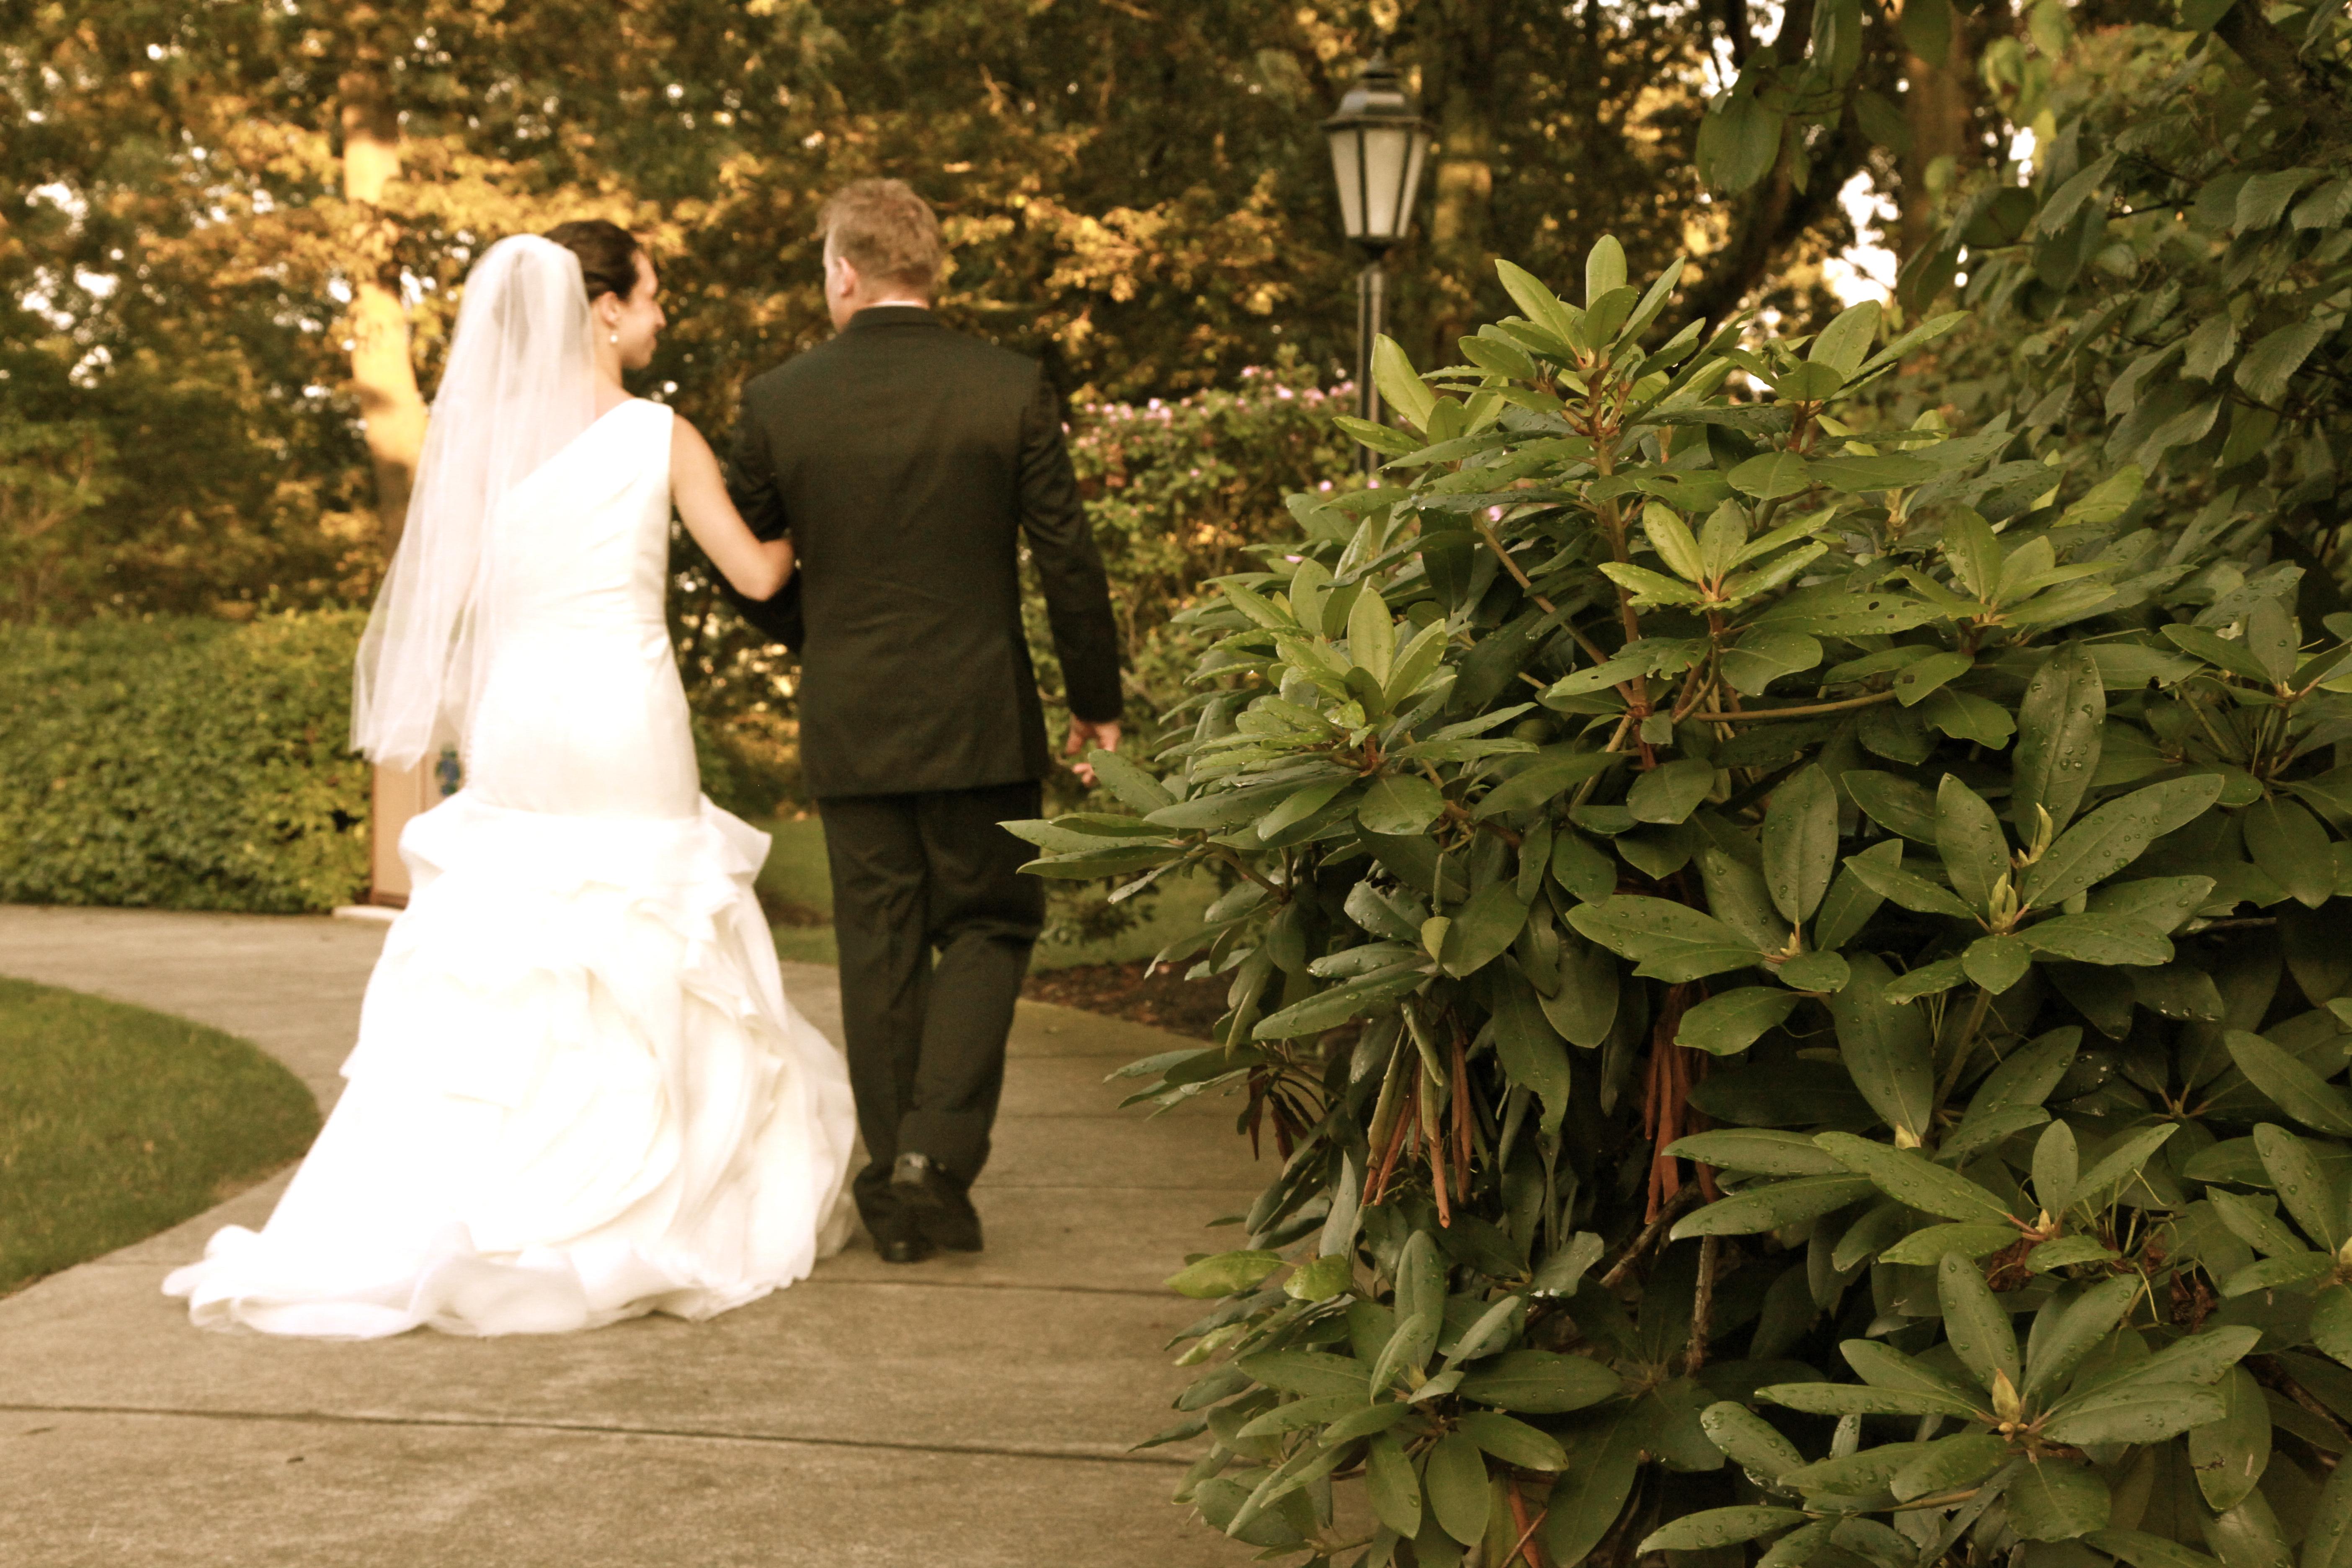 Wedding Walk away Picture